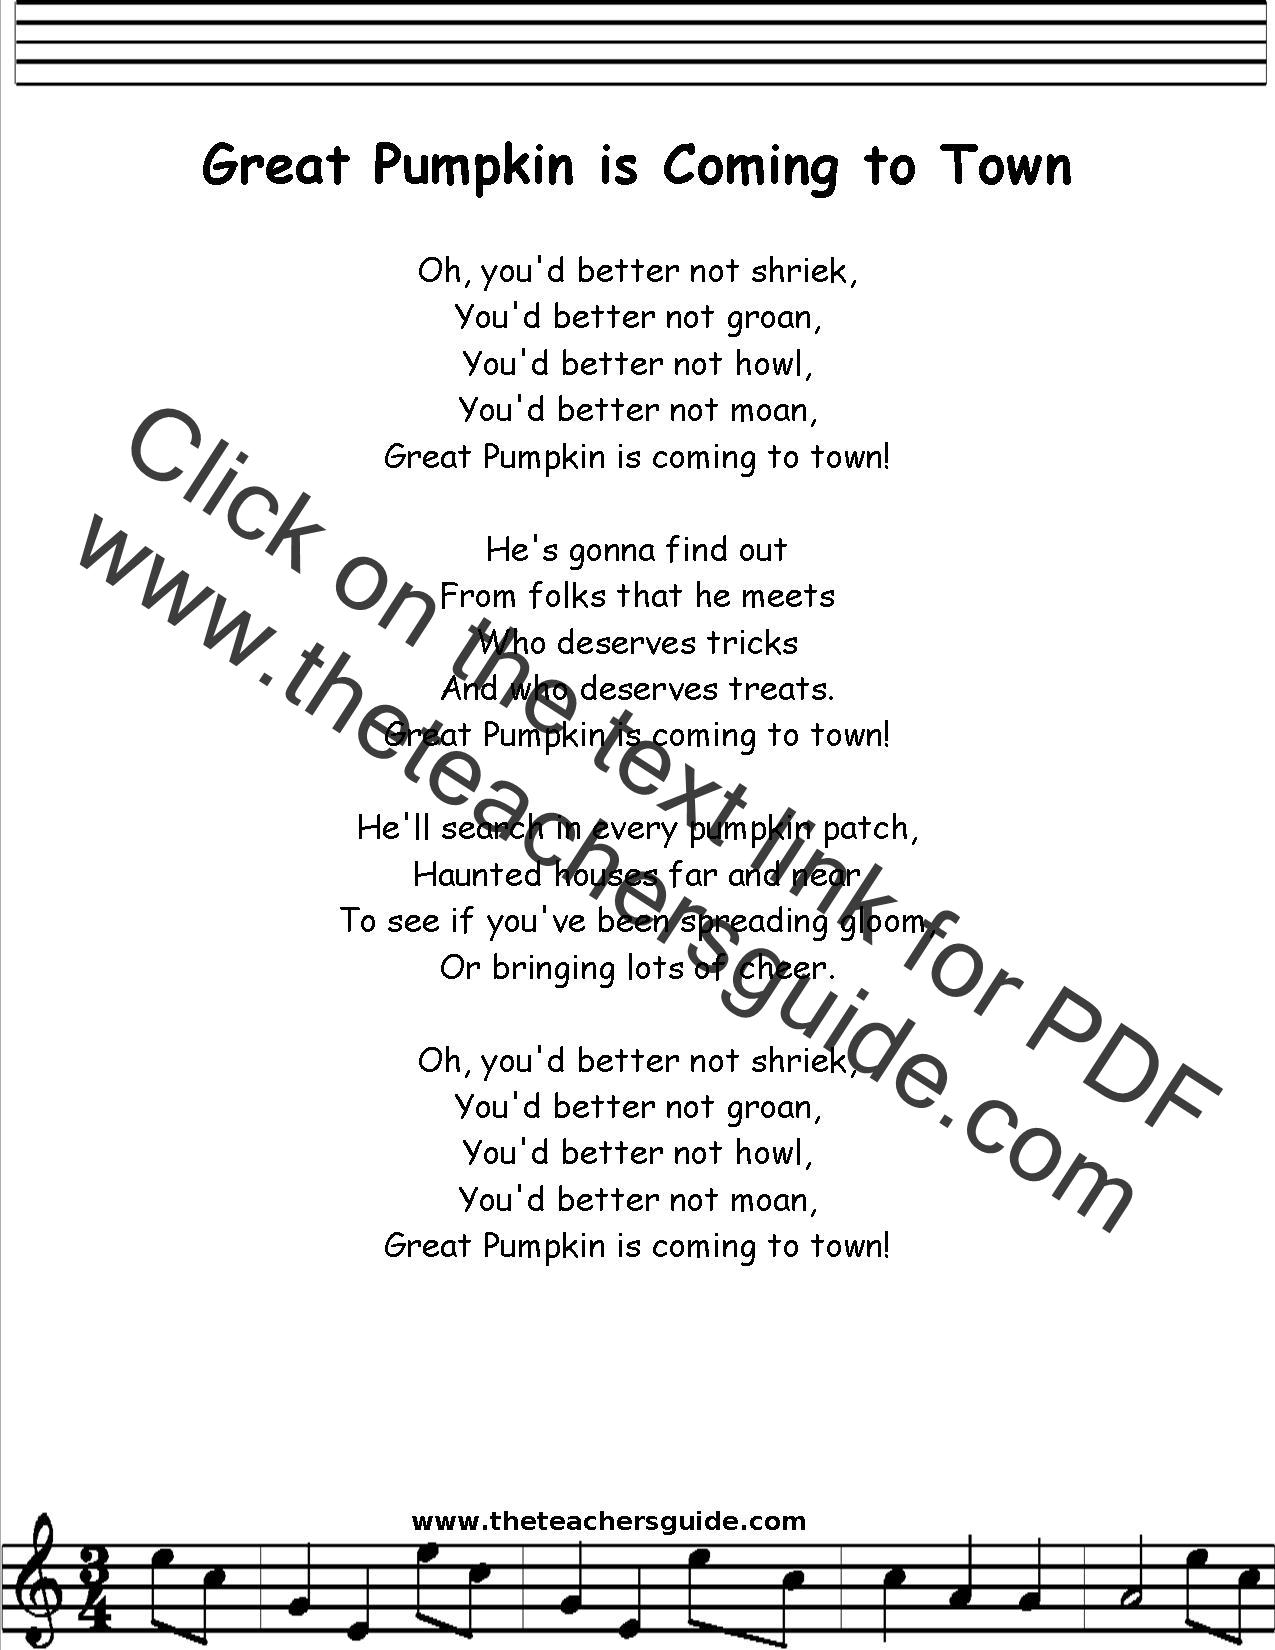 Great Pumpkin Lyrics Printout Midi And Video